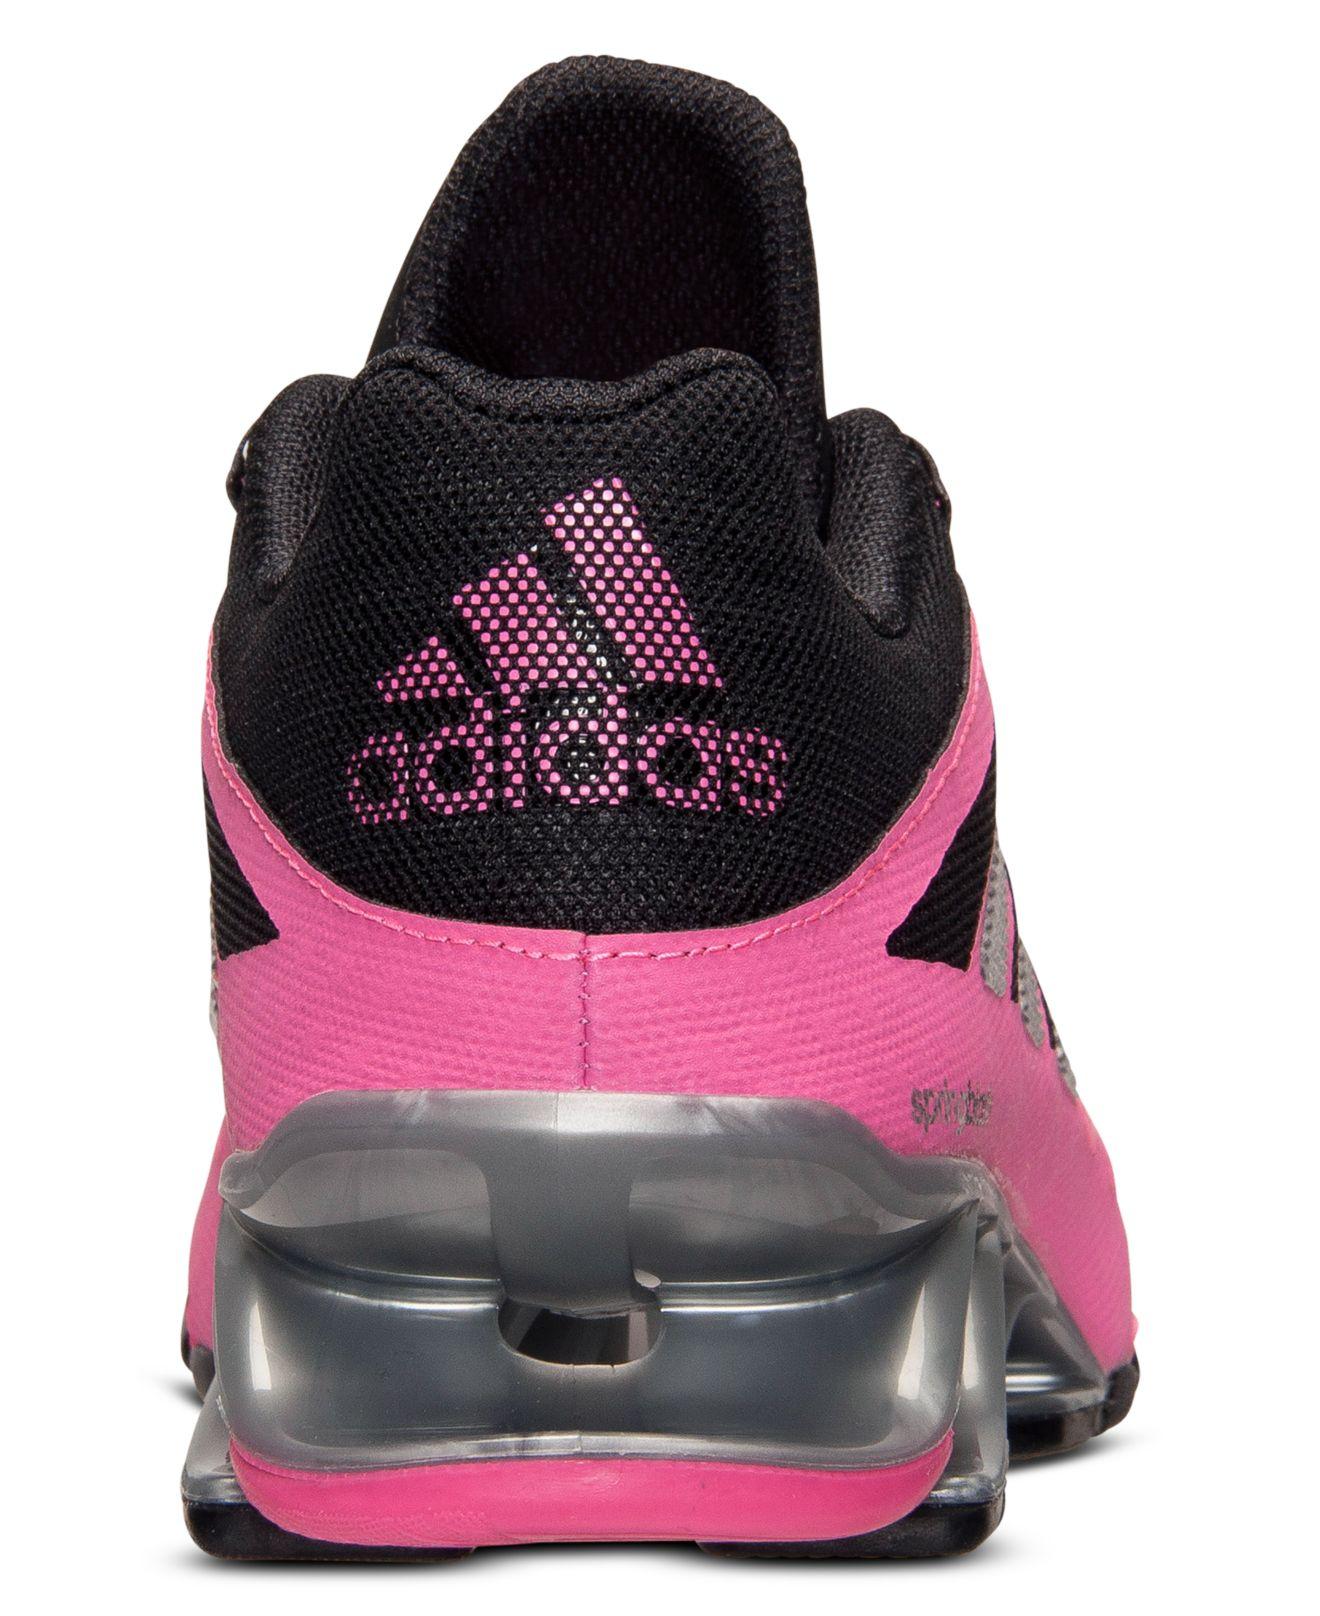 adidas springblade ignite pink